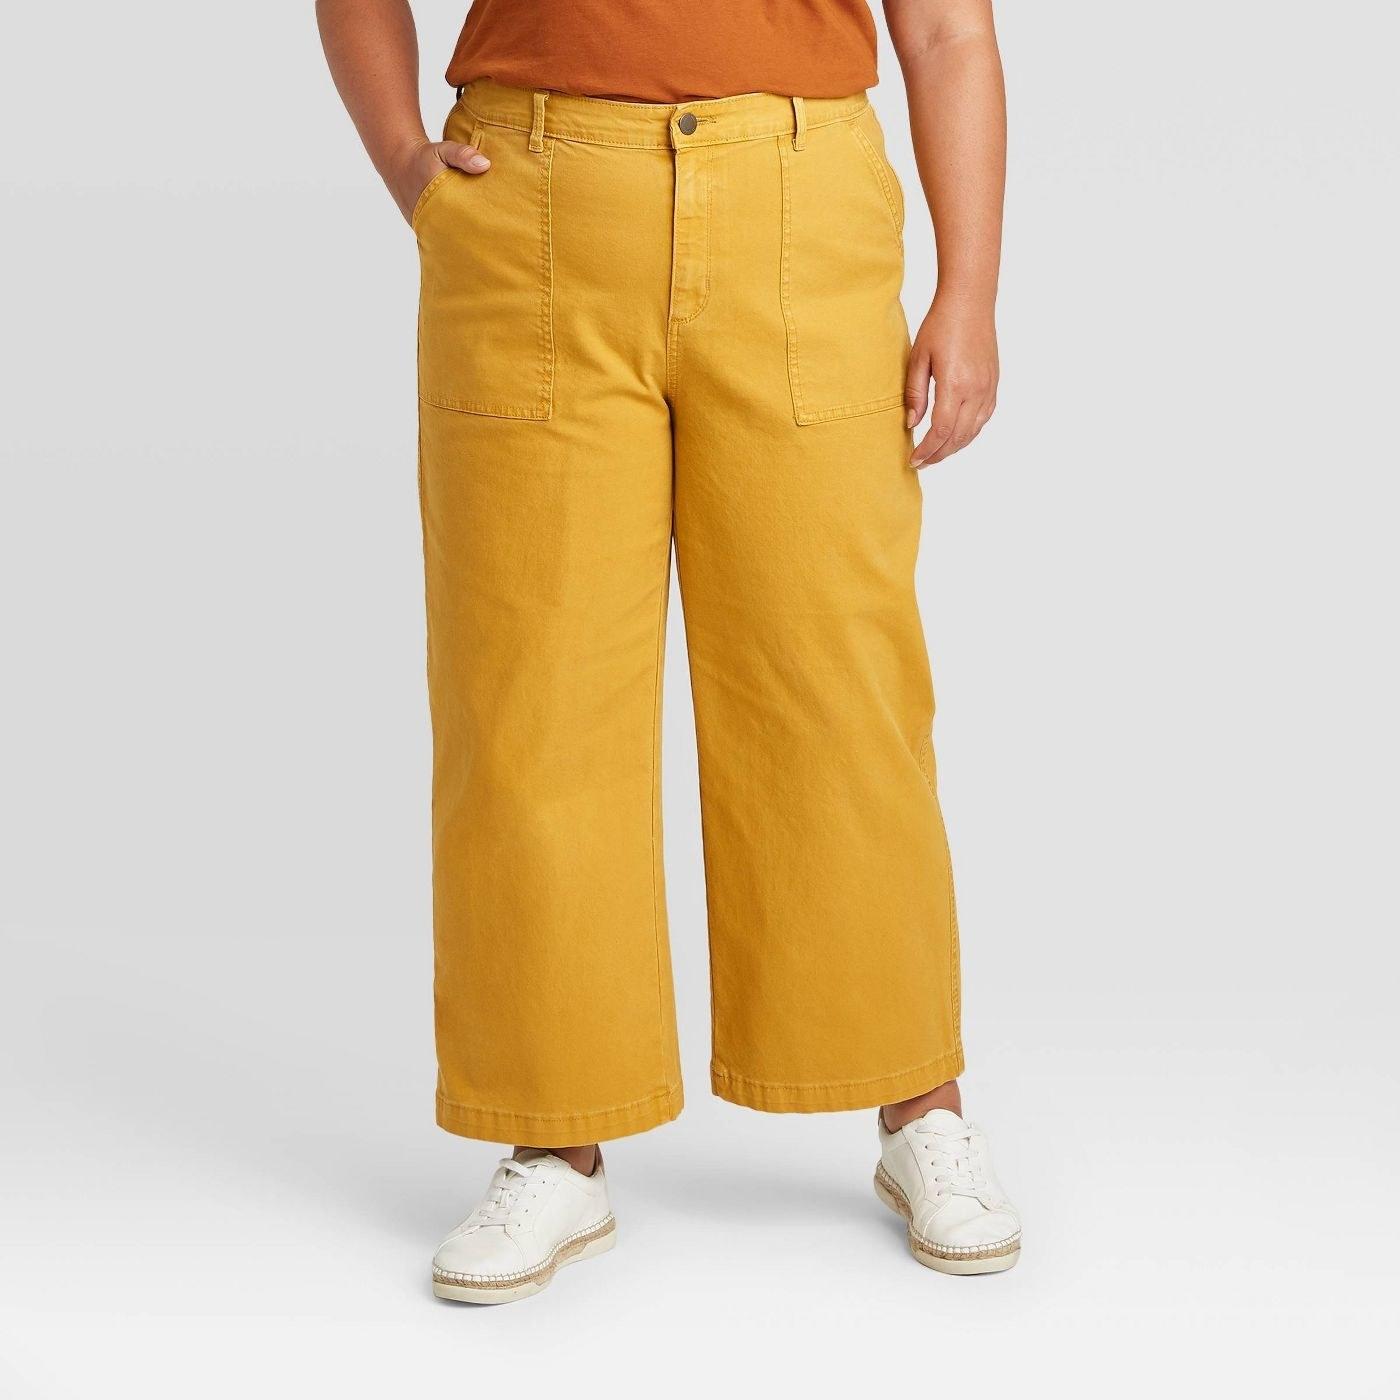 Model wearing yellow wide leg pants